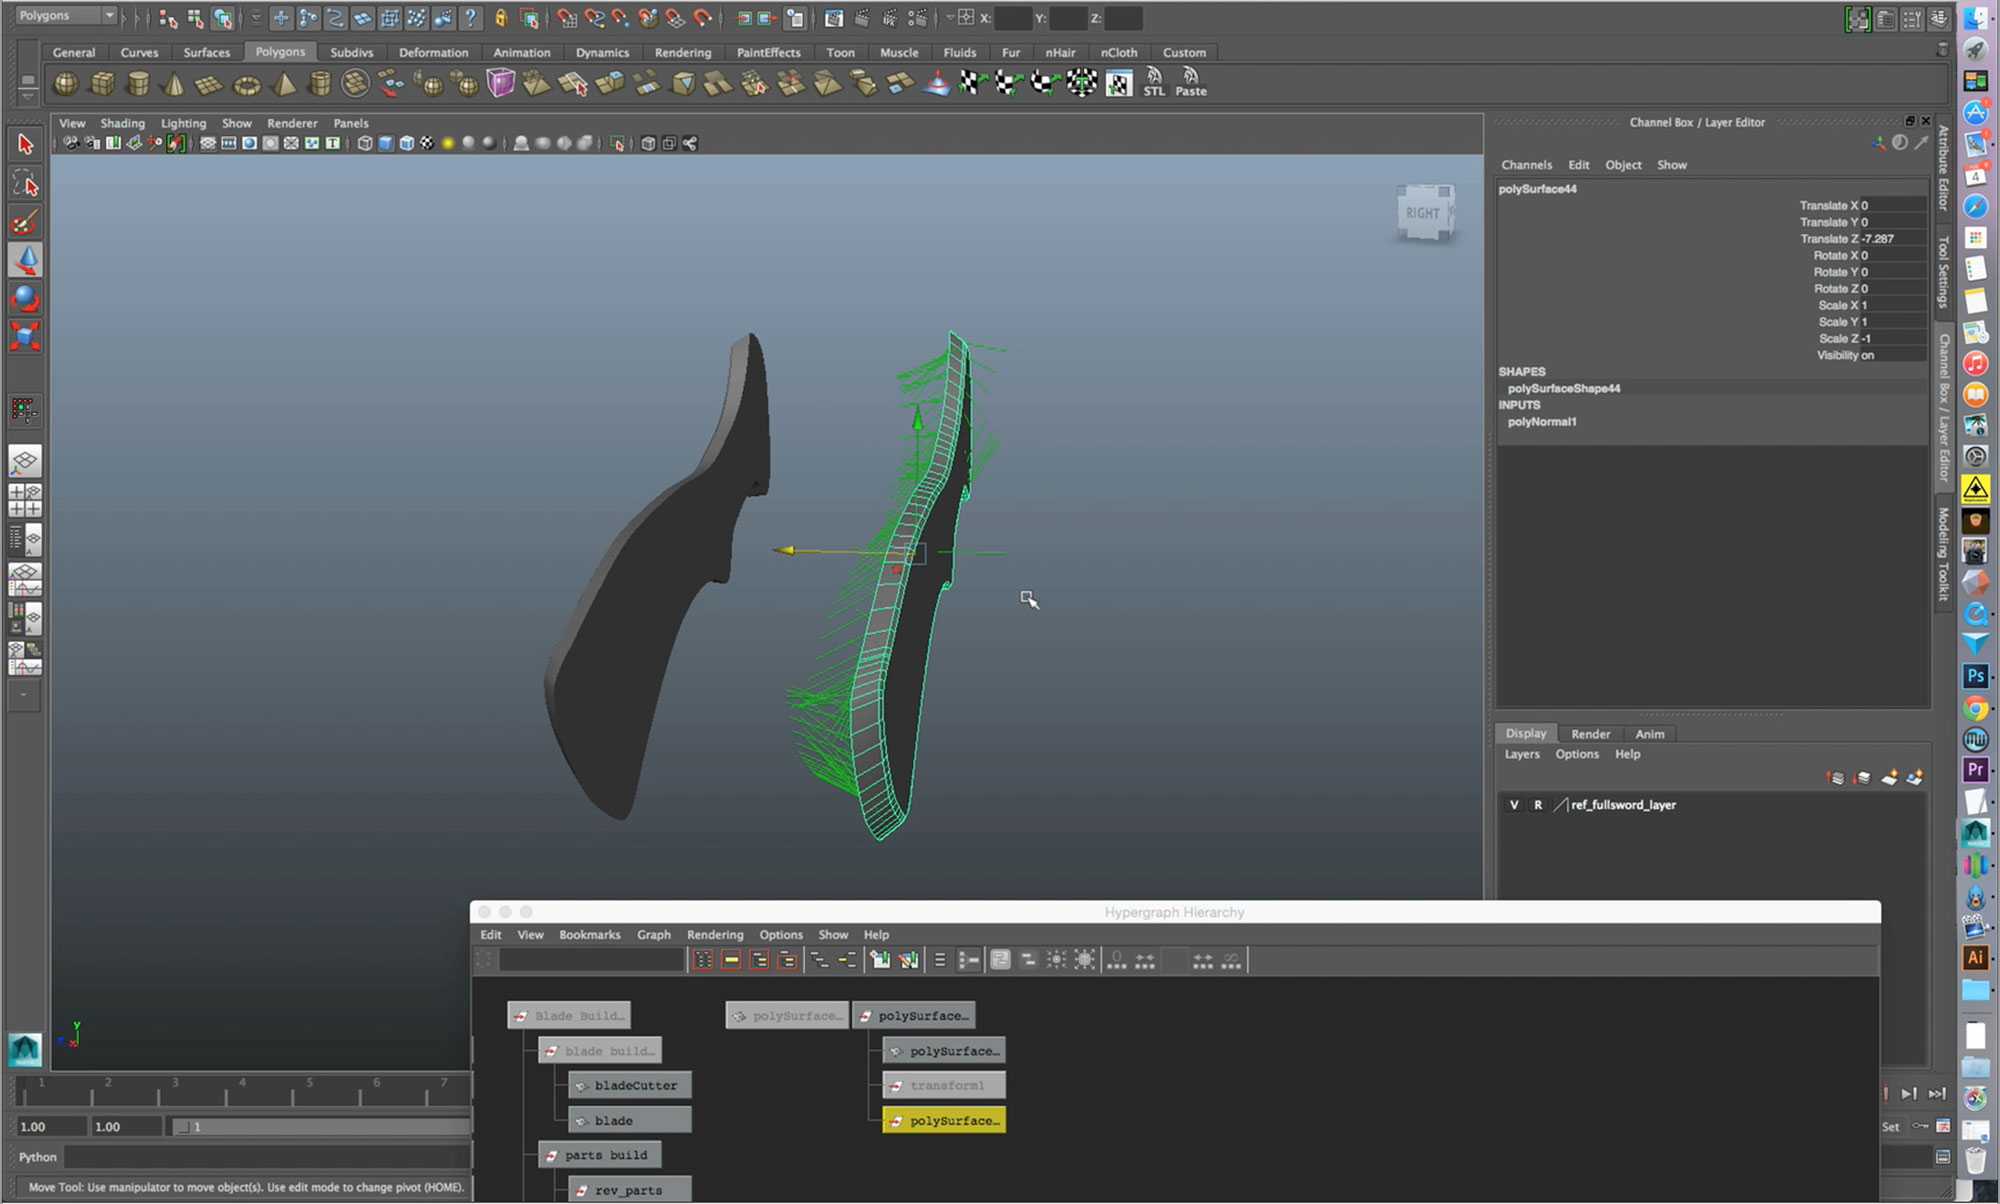 projects_edit-handel-11.jpg